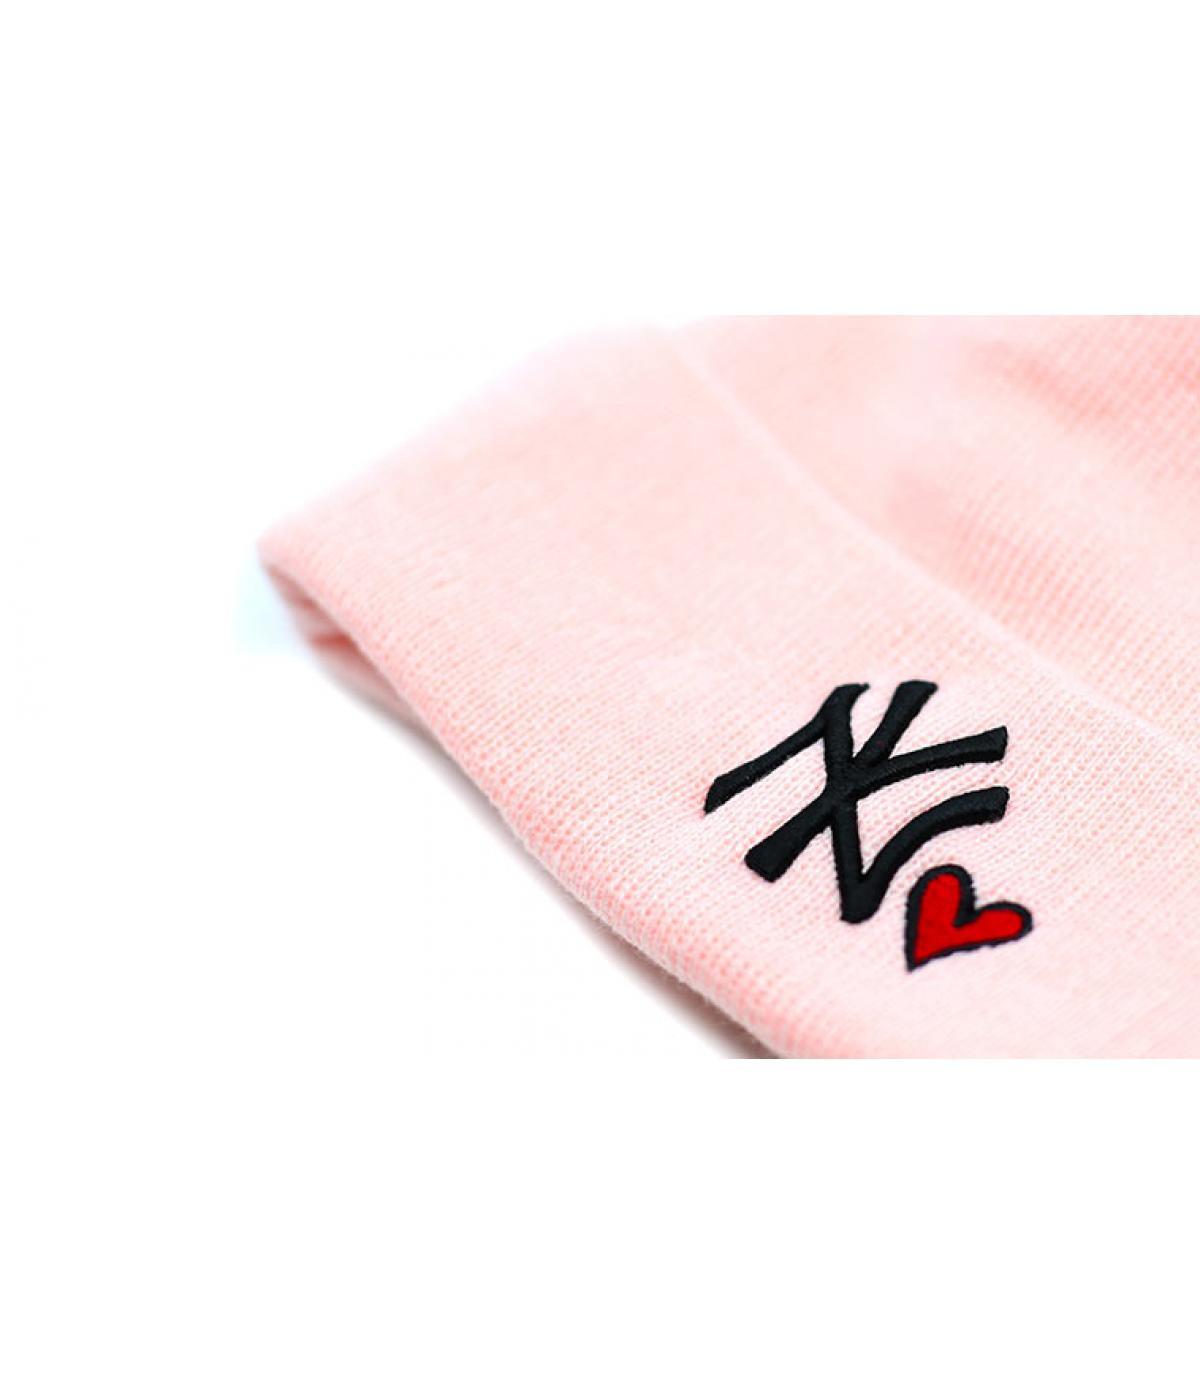 Dettagli Bonnet Wmns Heart NY knit pink - image 3